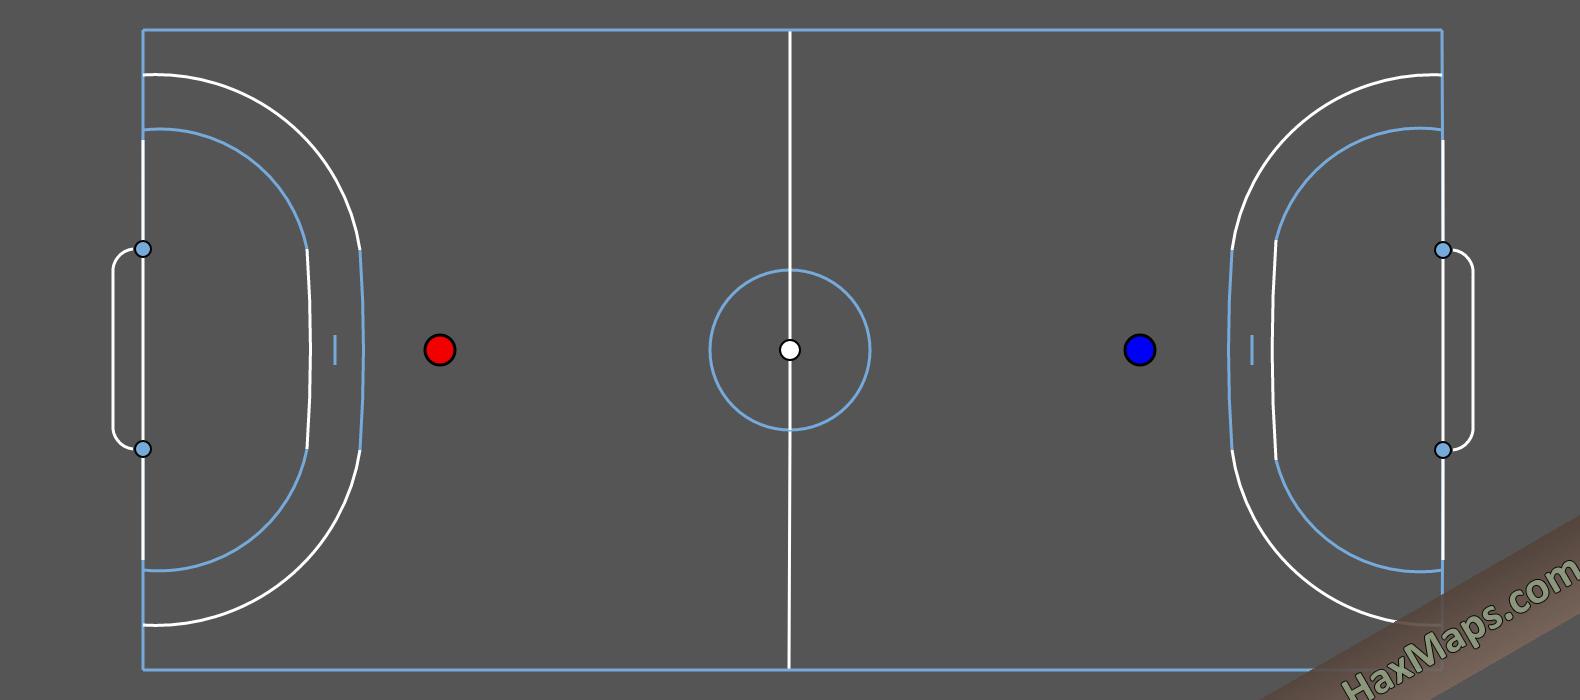 hax ball maps | Stade Vélodrome • OM •